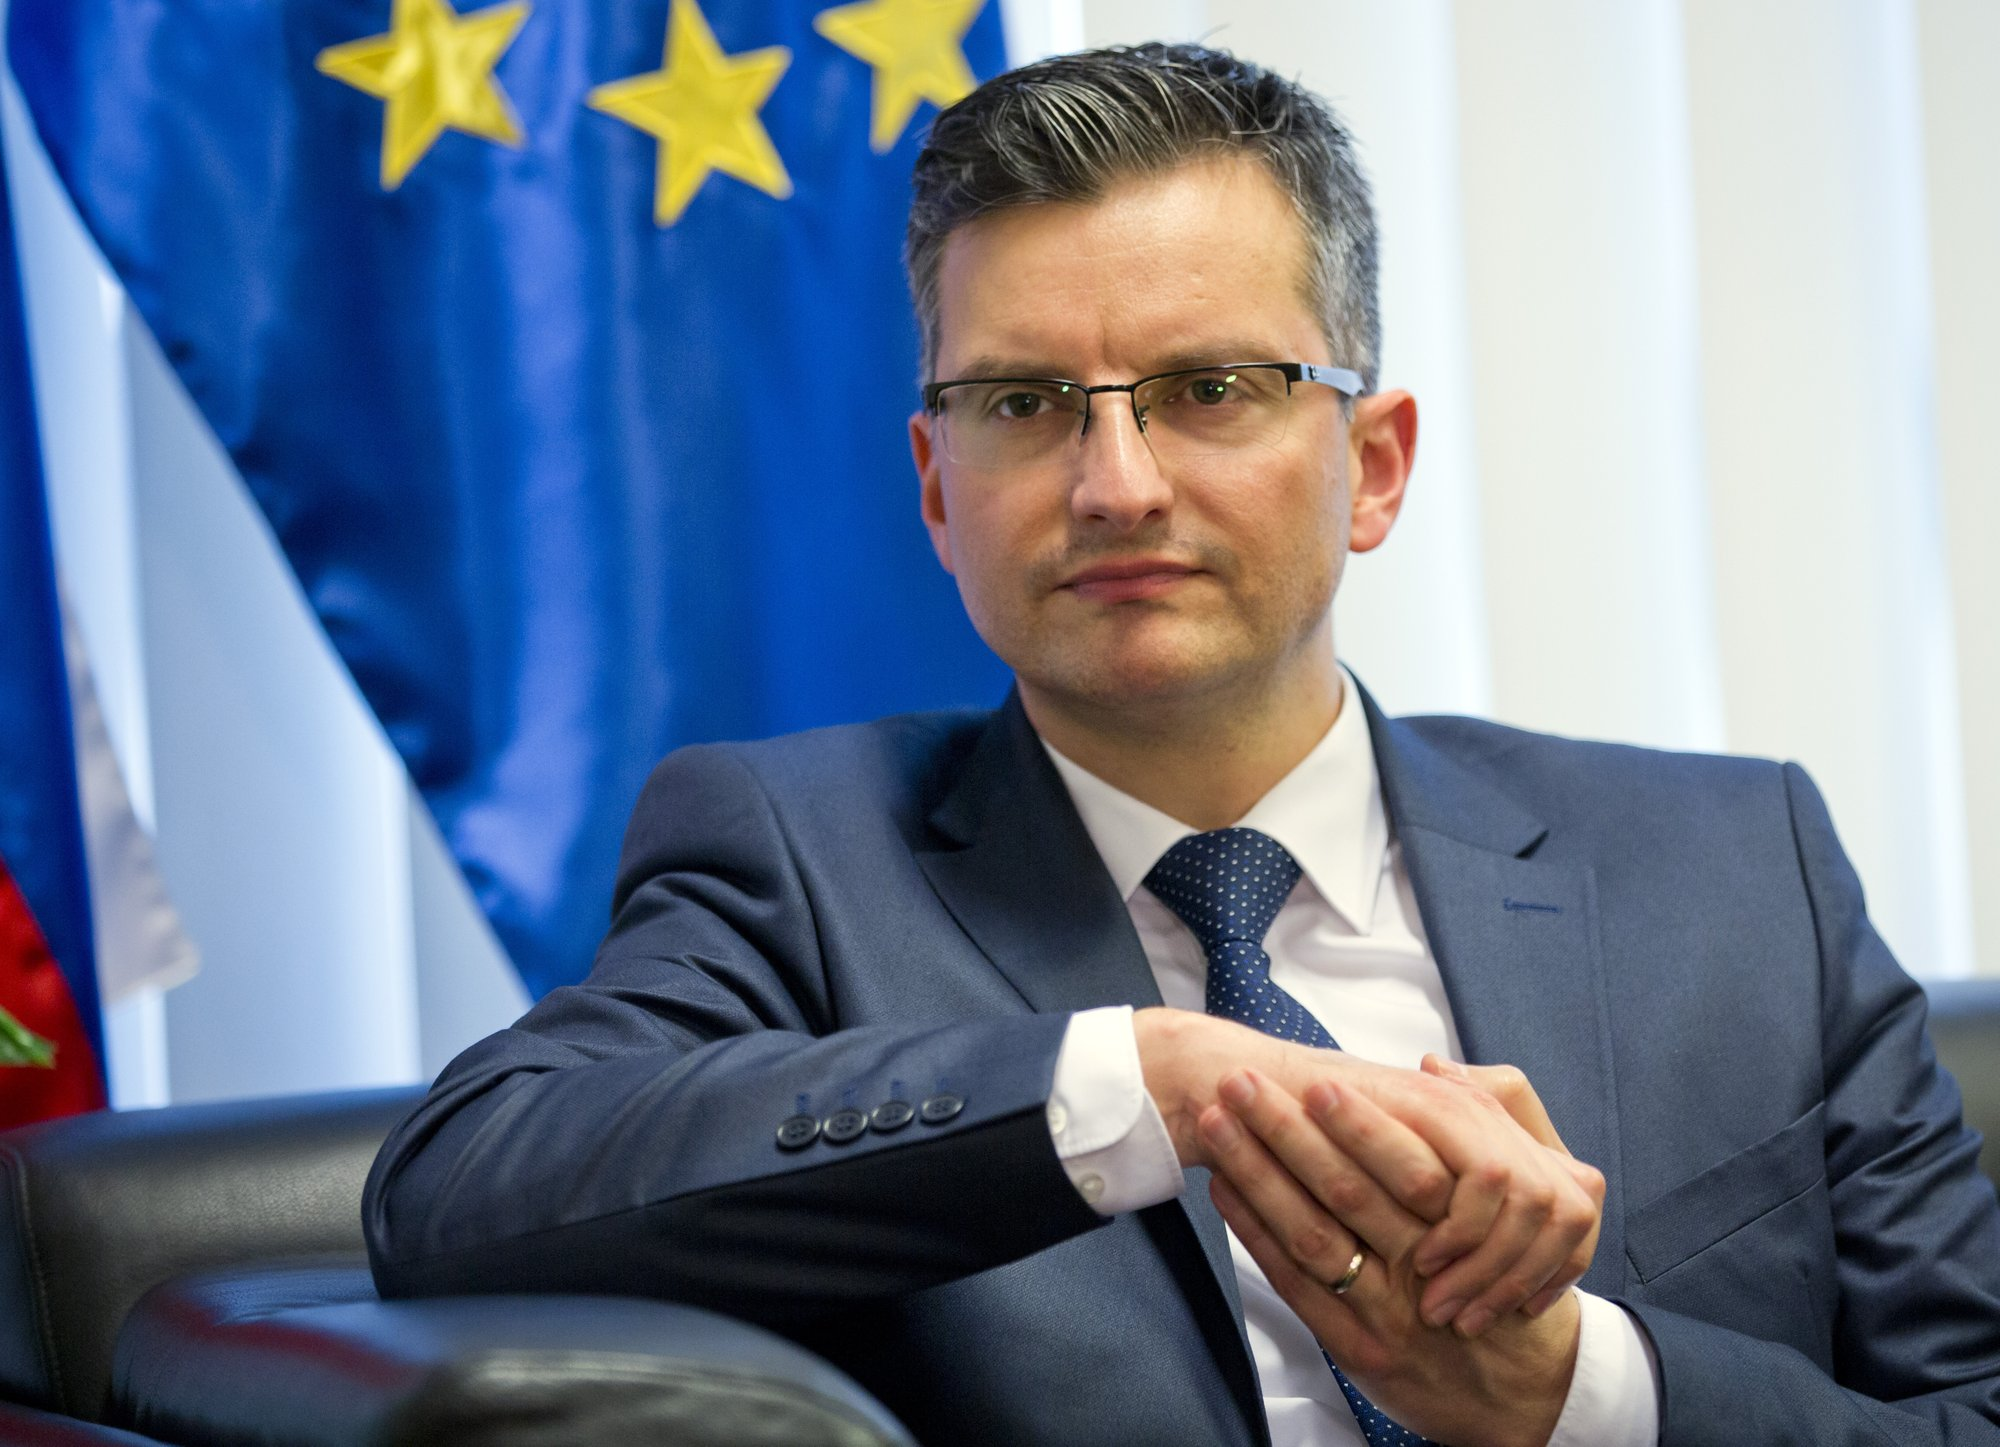 AP Interview: Slovenia leader warns EU to counter populism